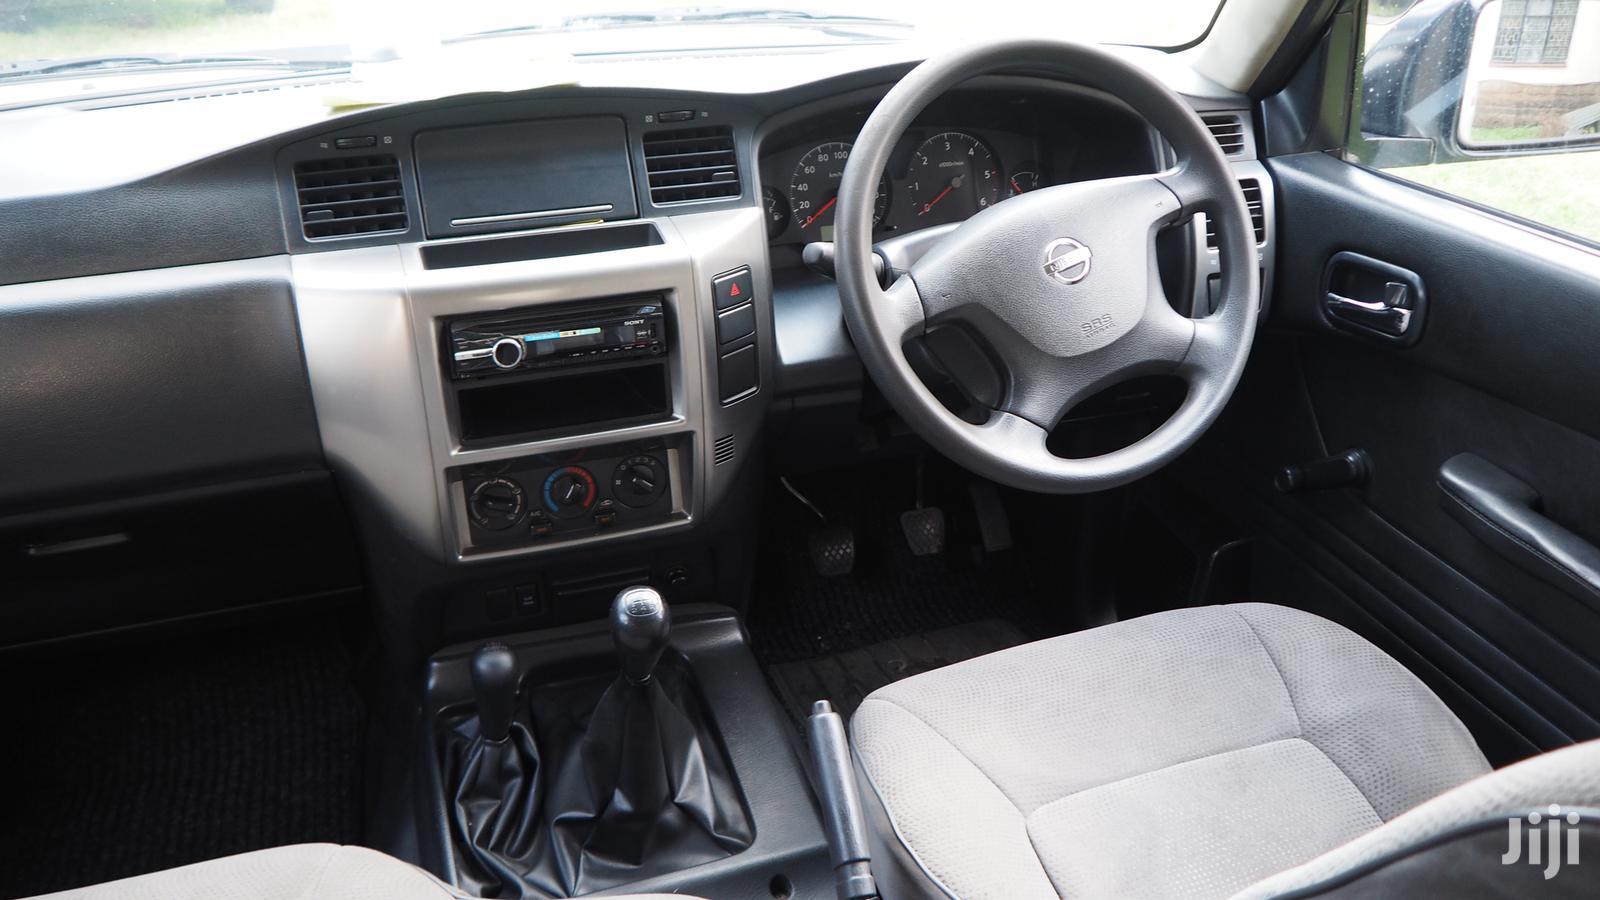 Archive: Nissan Patrol 2010 White